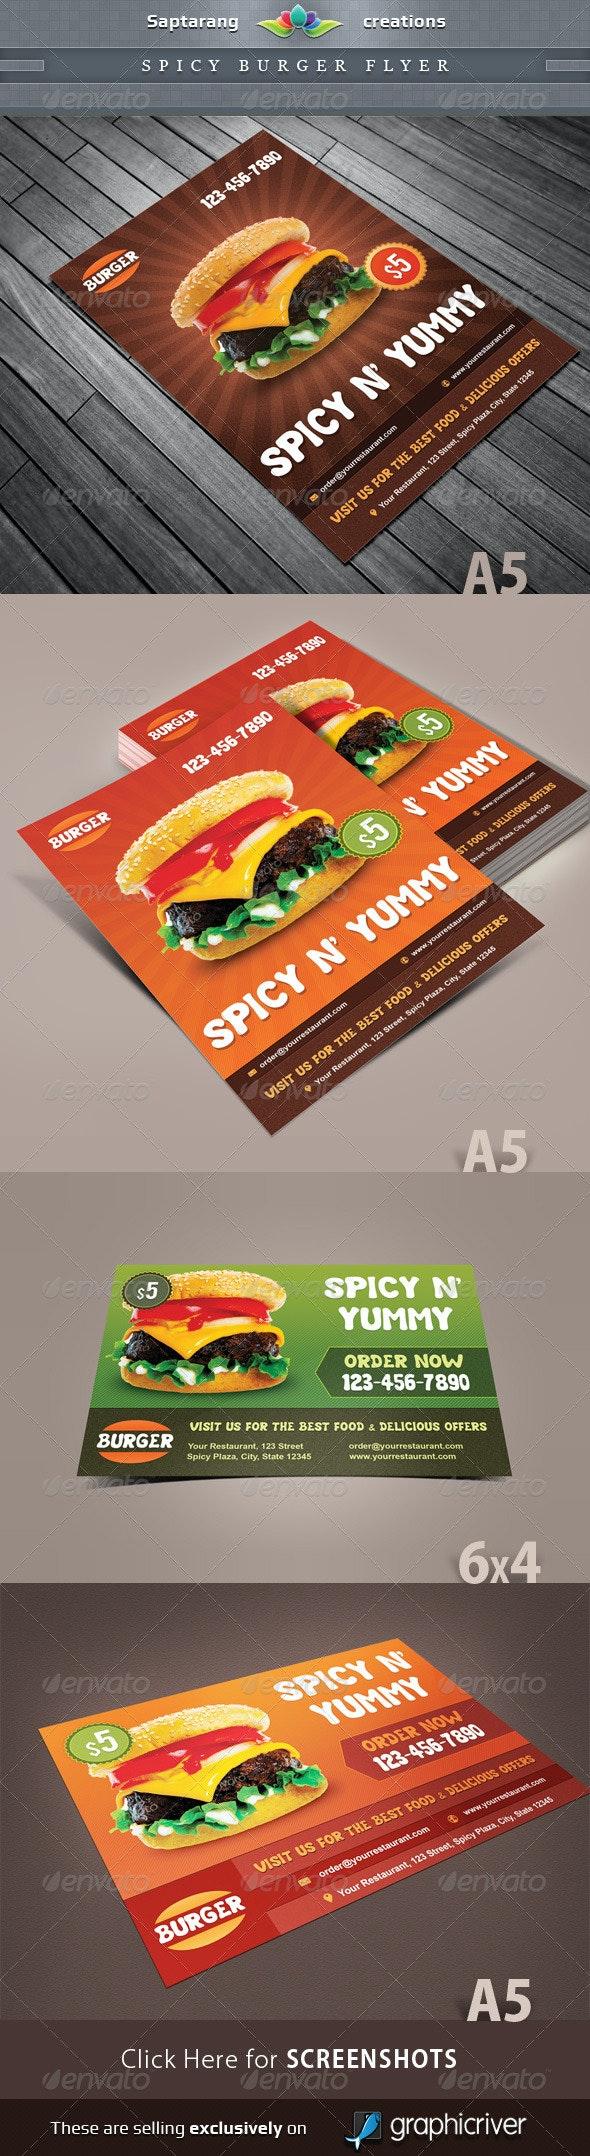 Spicy Burger Flyer - Restaurant Flyers